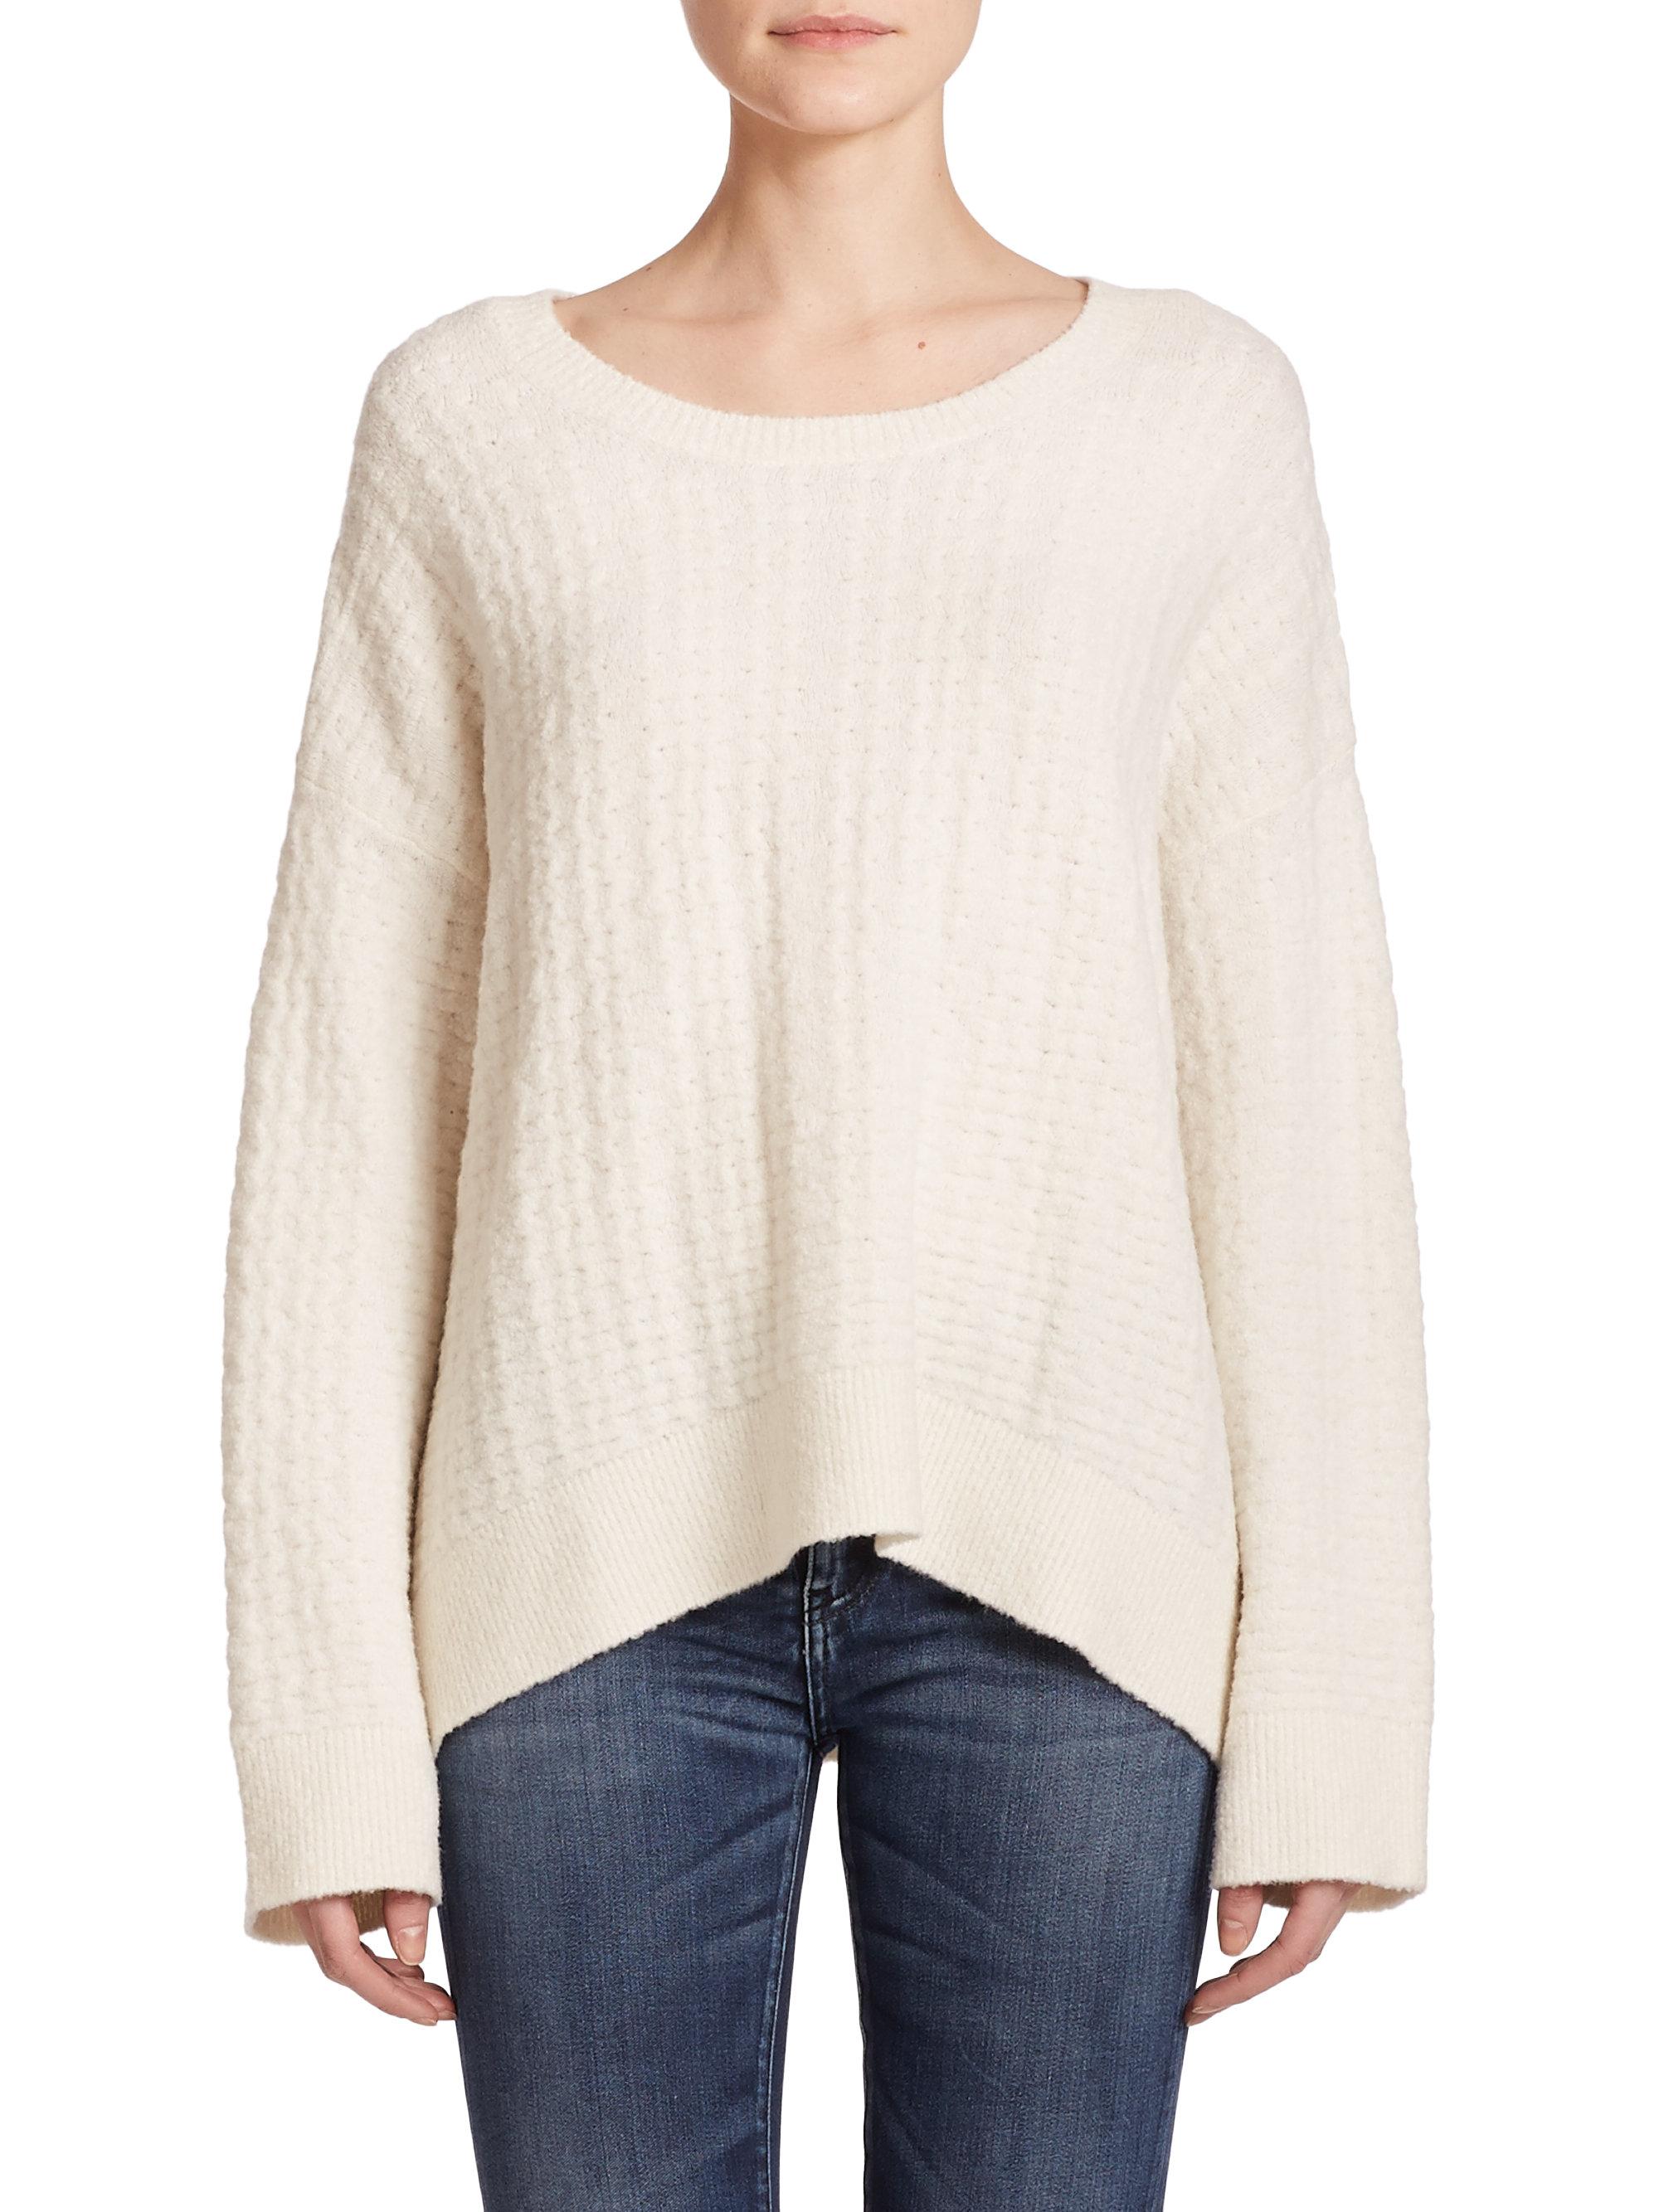 Iro Spring Oversized Sweater in White | Lyst